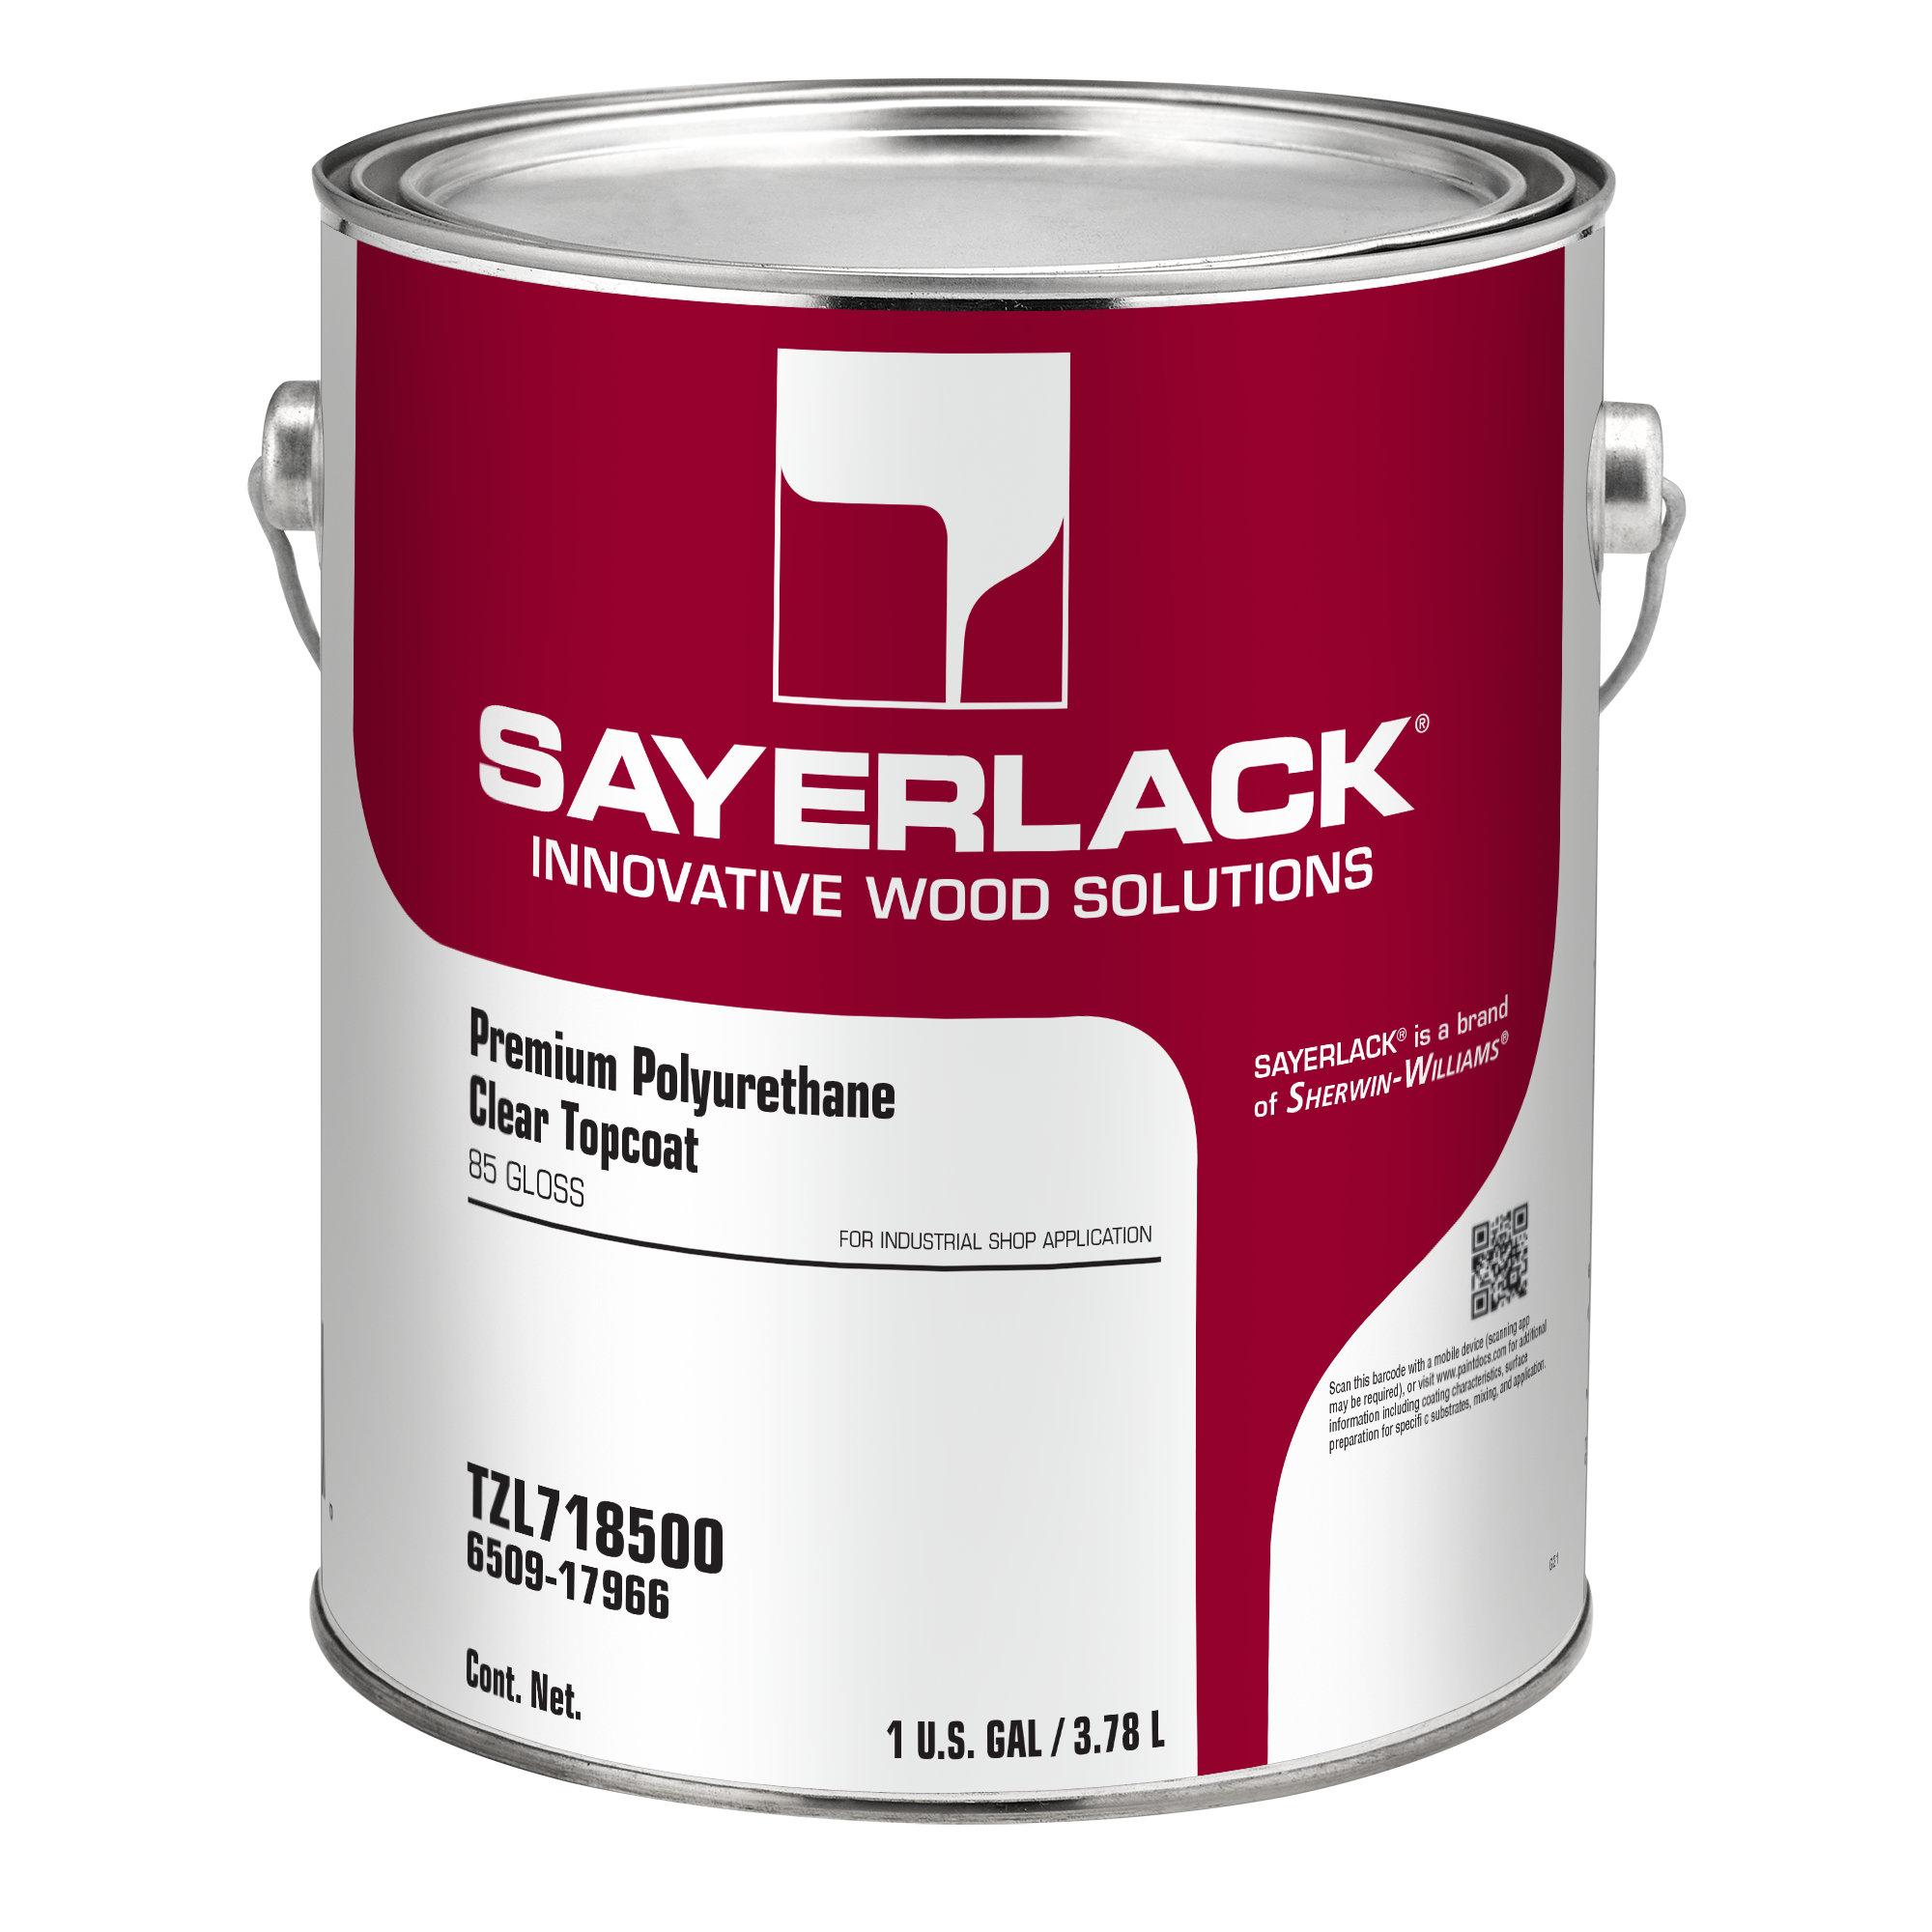 Sayerlack Premium Polyurethane Clear Topcoat